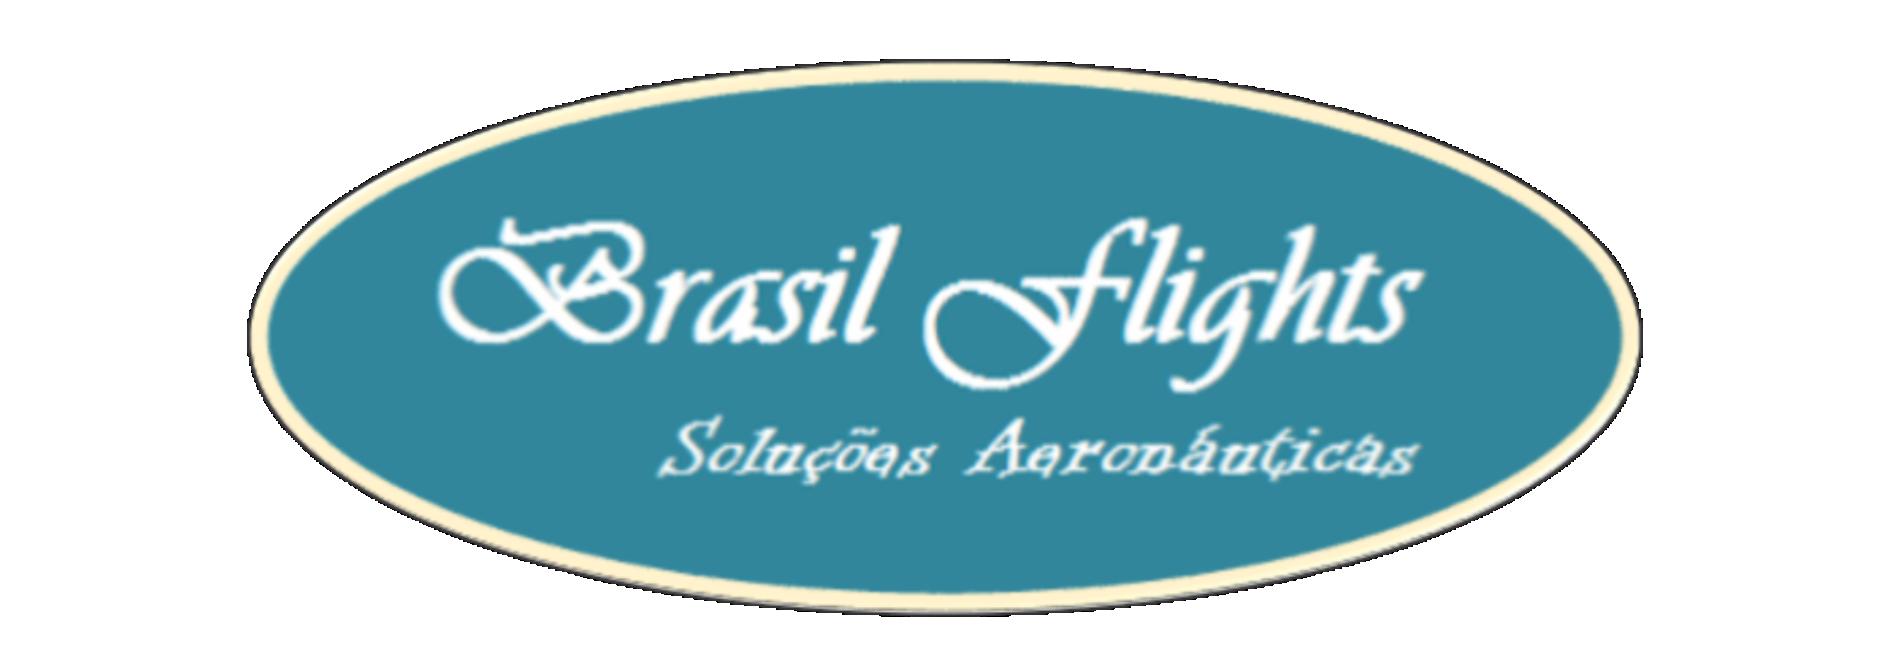 https://www.abraphe.org.br/wp-content/uploads/2019/04/brasil-flights.png